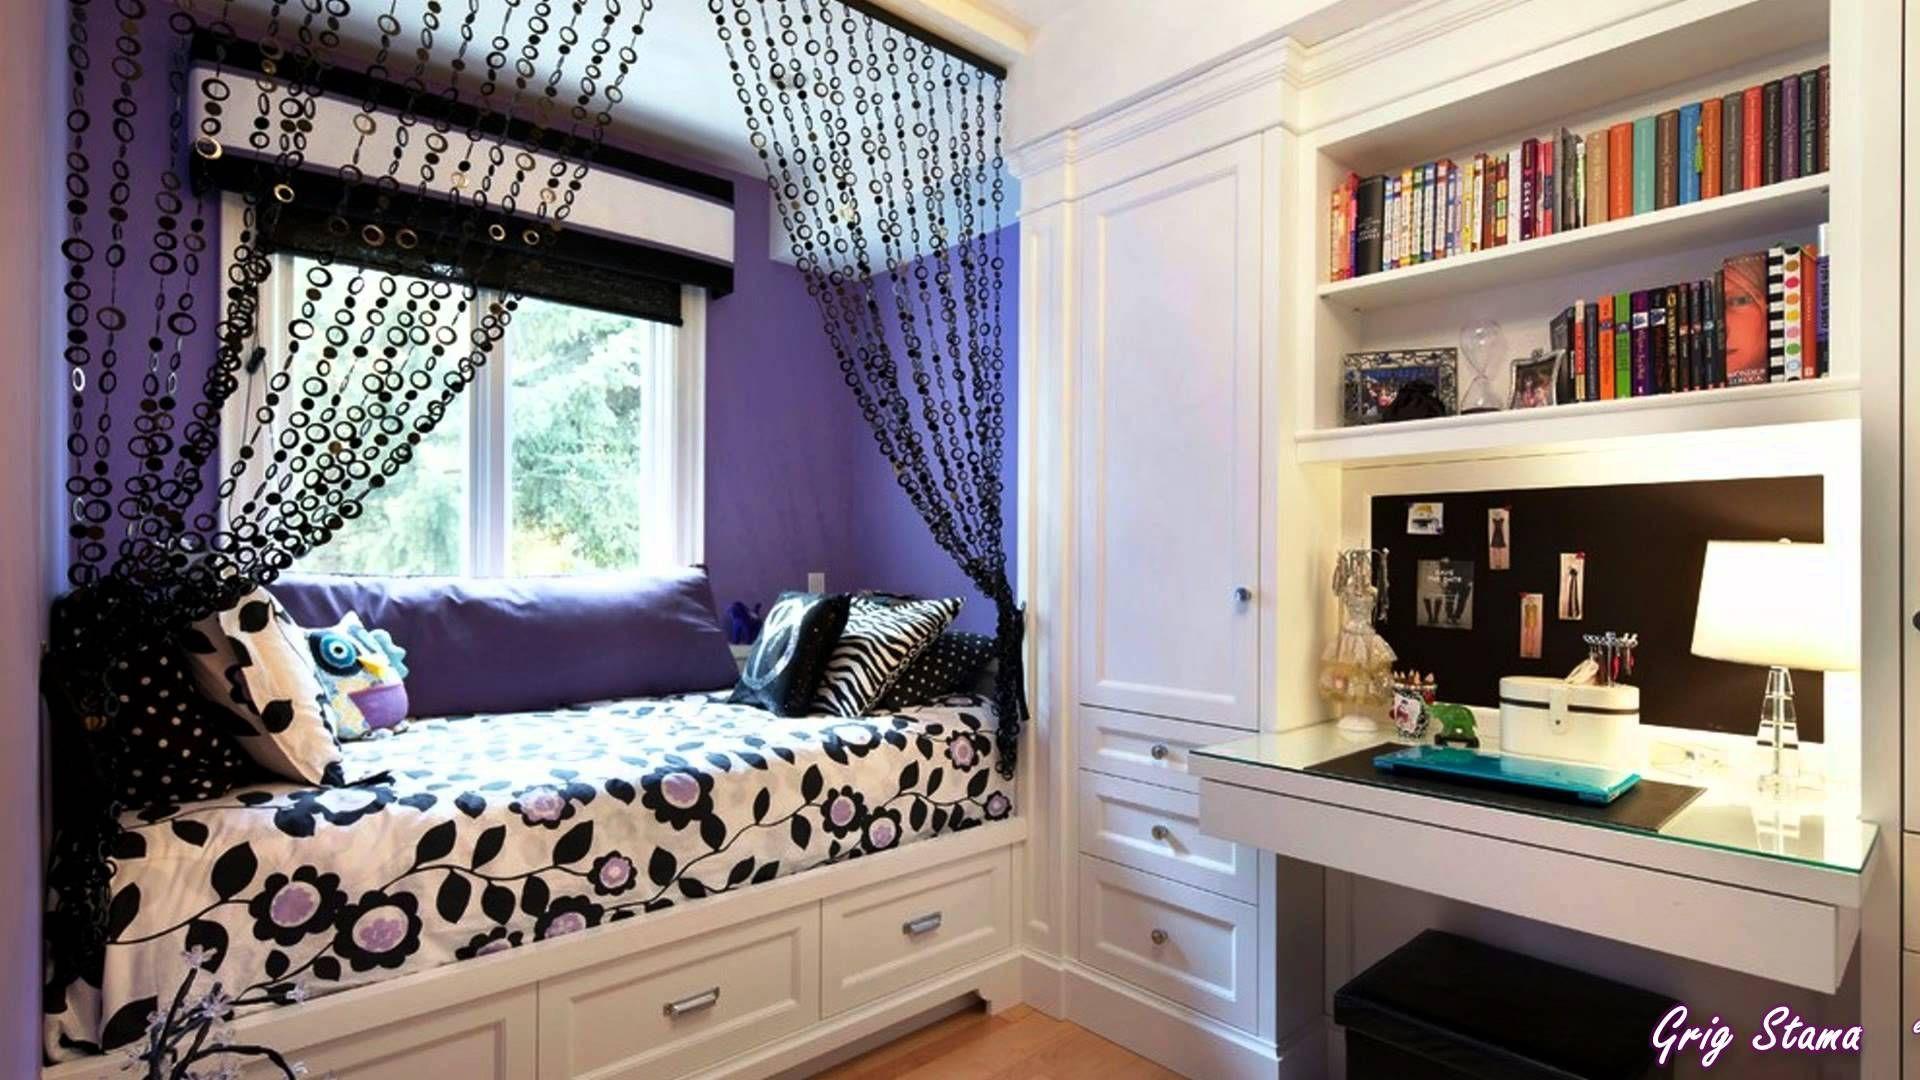 Bedroom ideas for teenage girls tumblr simple cosmoplast biz